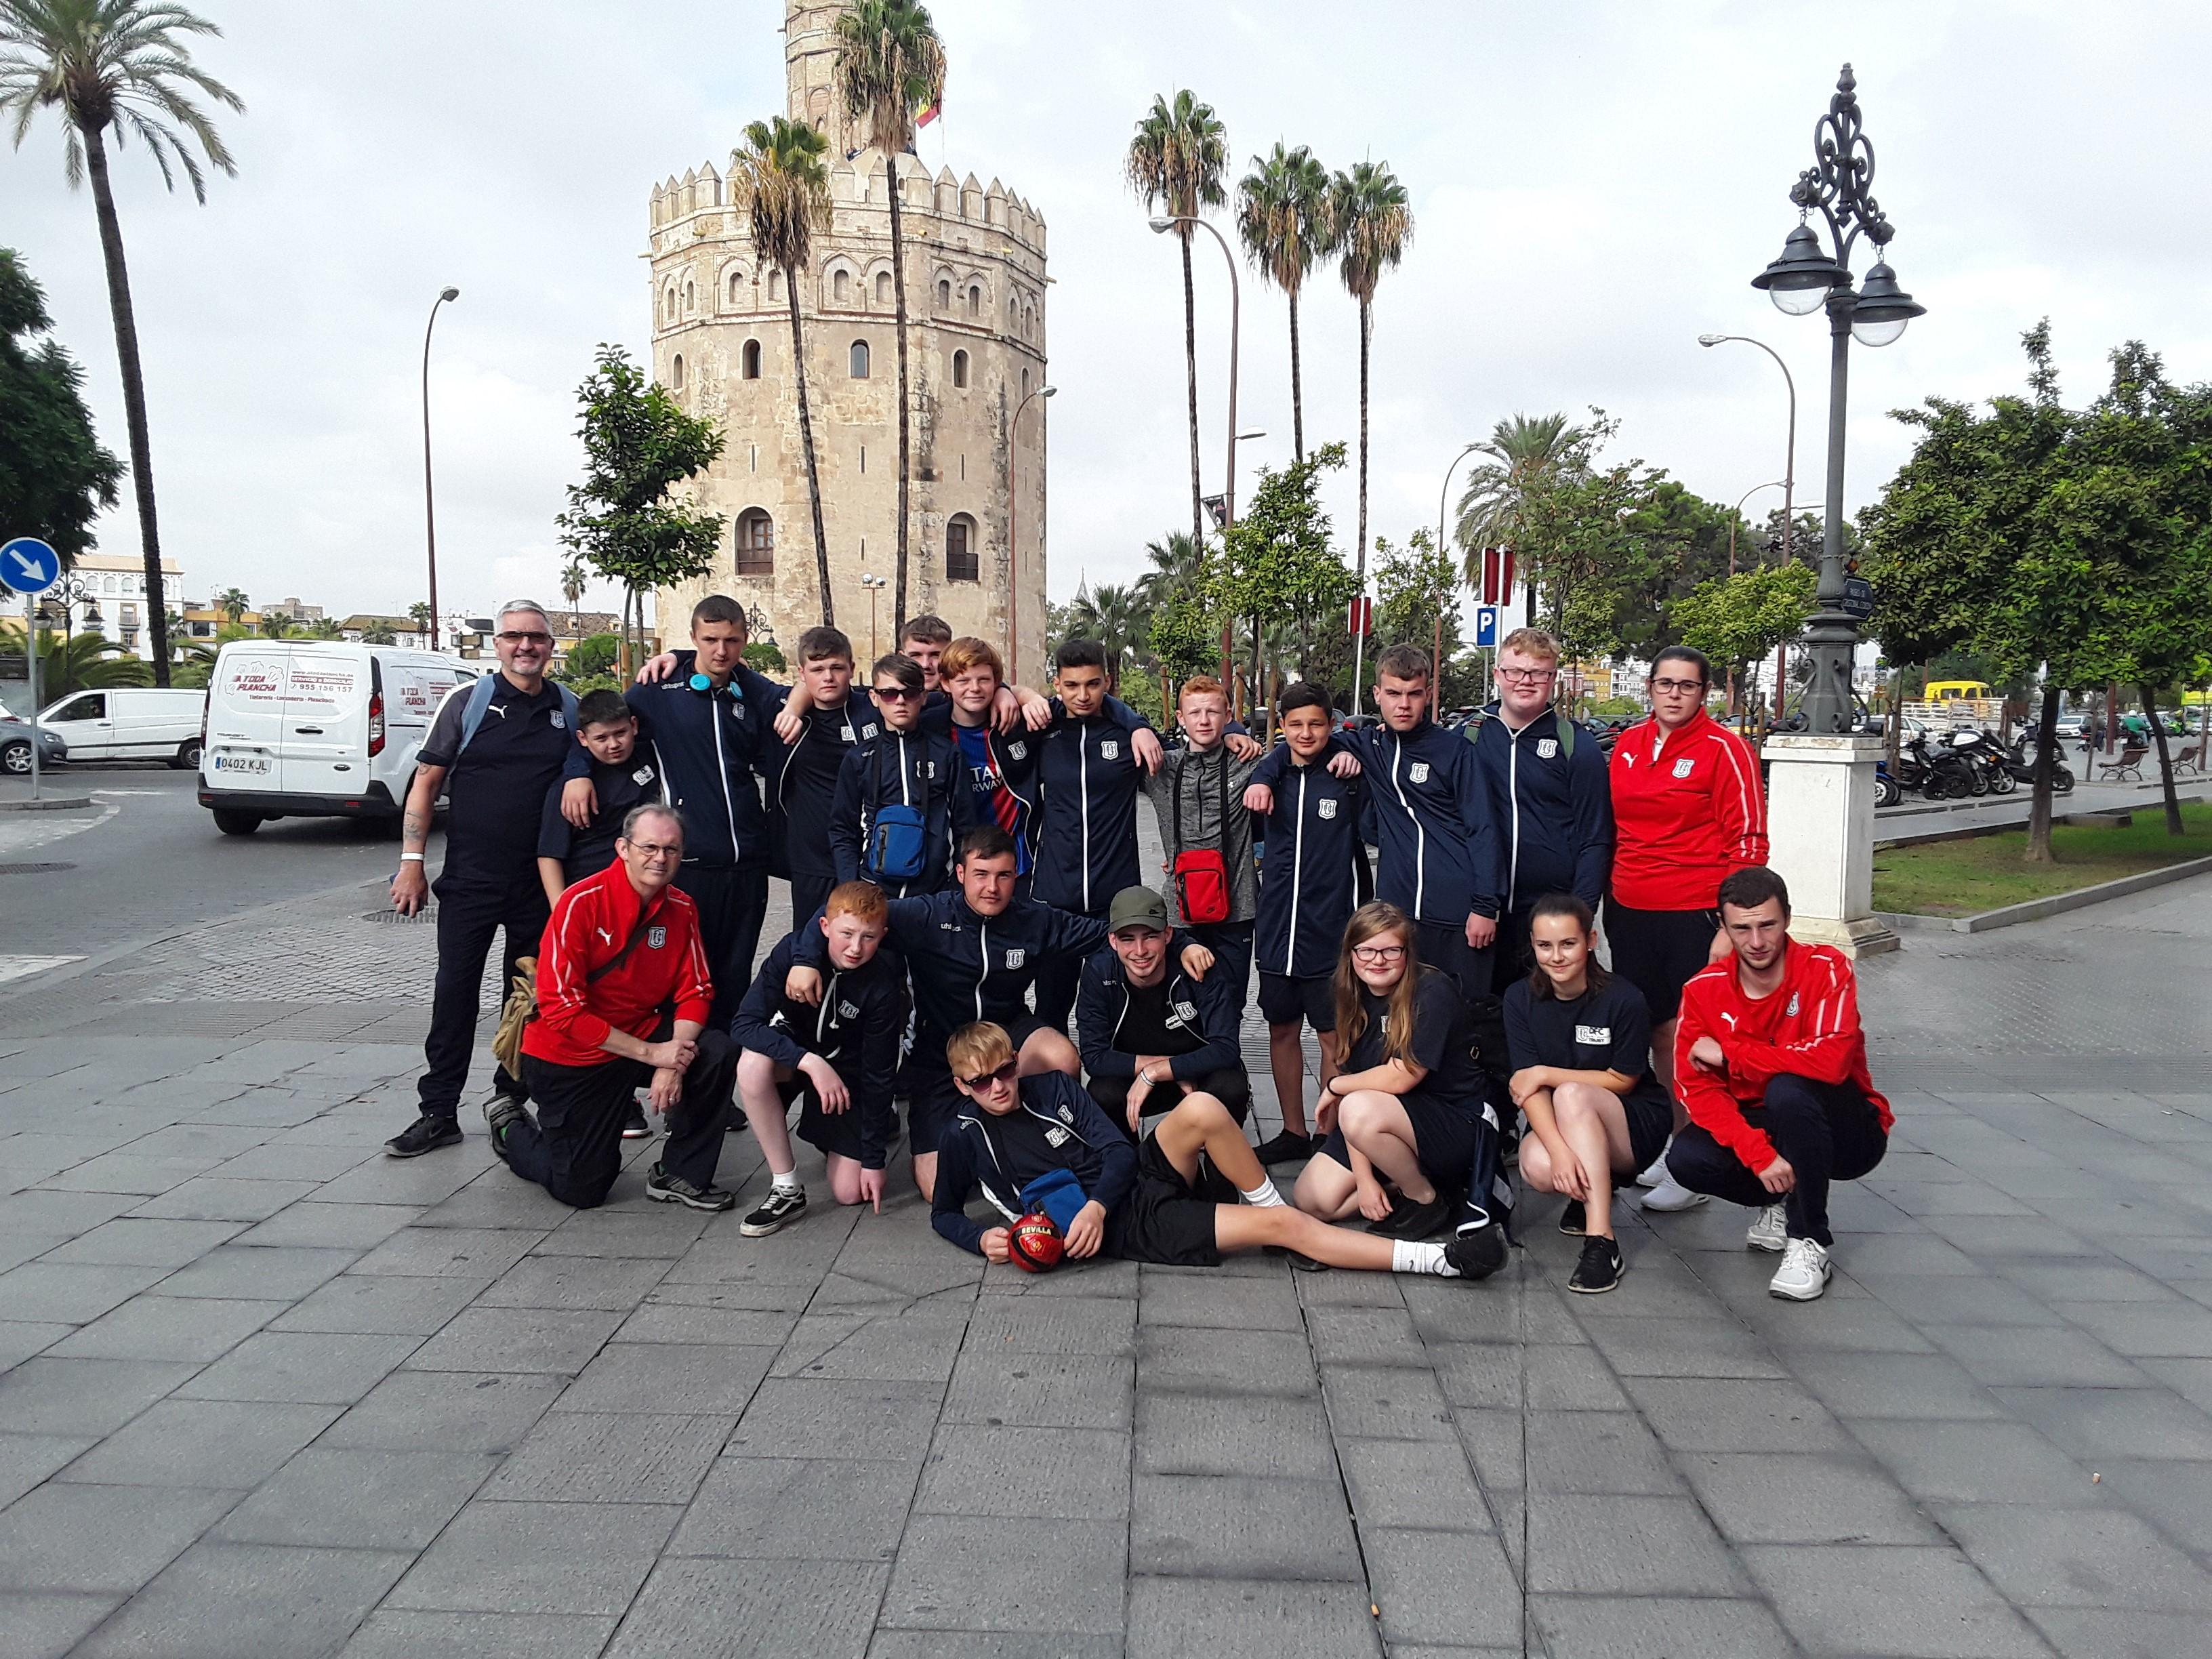 The team in Spain.